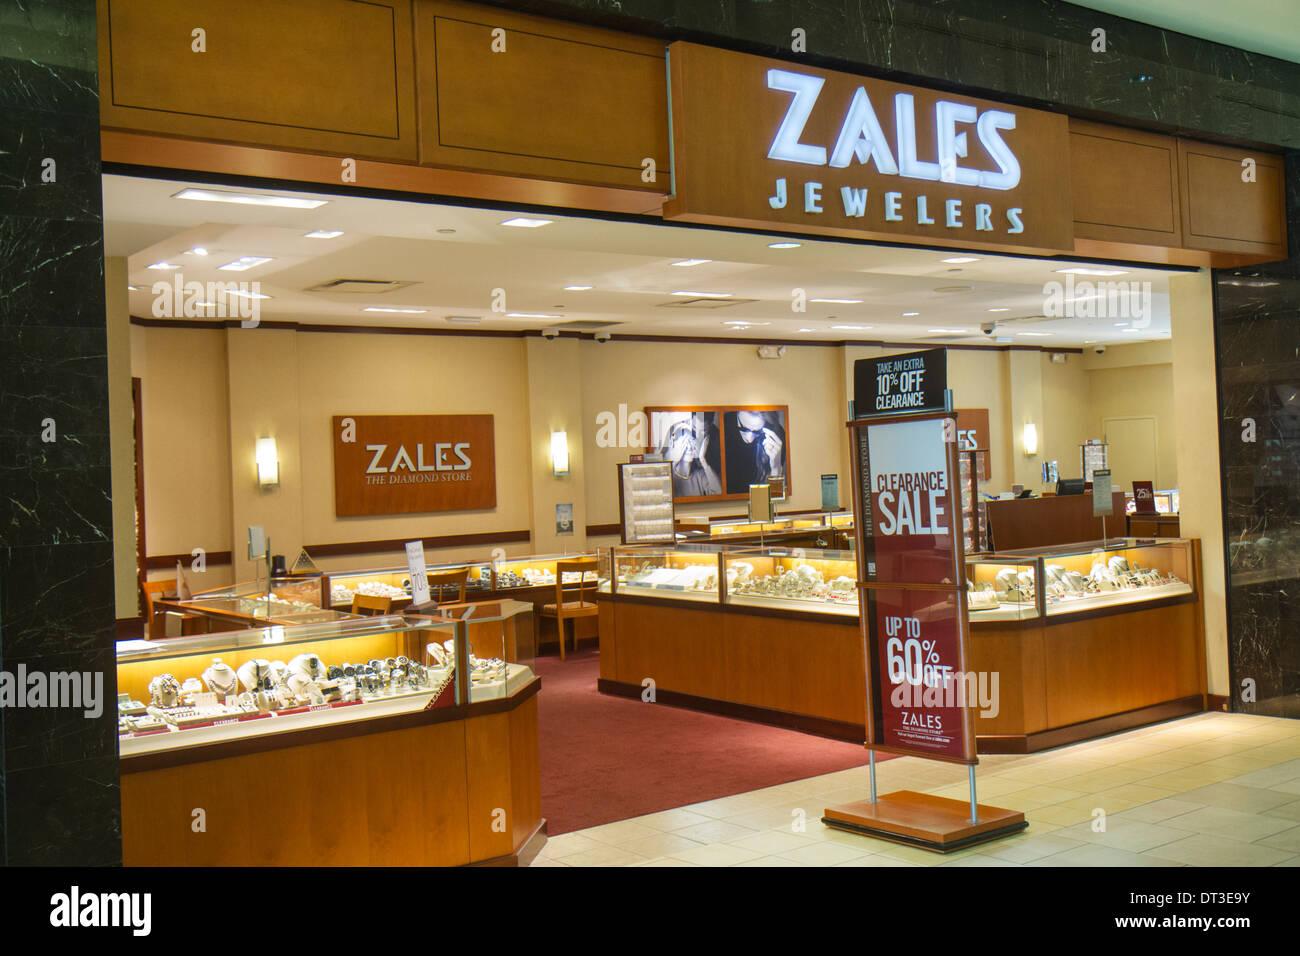 Fort Myers Florida Ft. Edison Mall Shopping Zales Juweliere Schmuck Schmuck Eingang Förderung anmelden Spiel 60%. Stockfoto